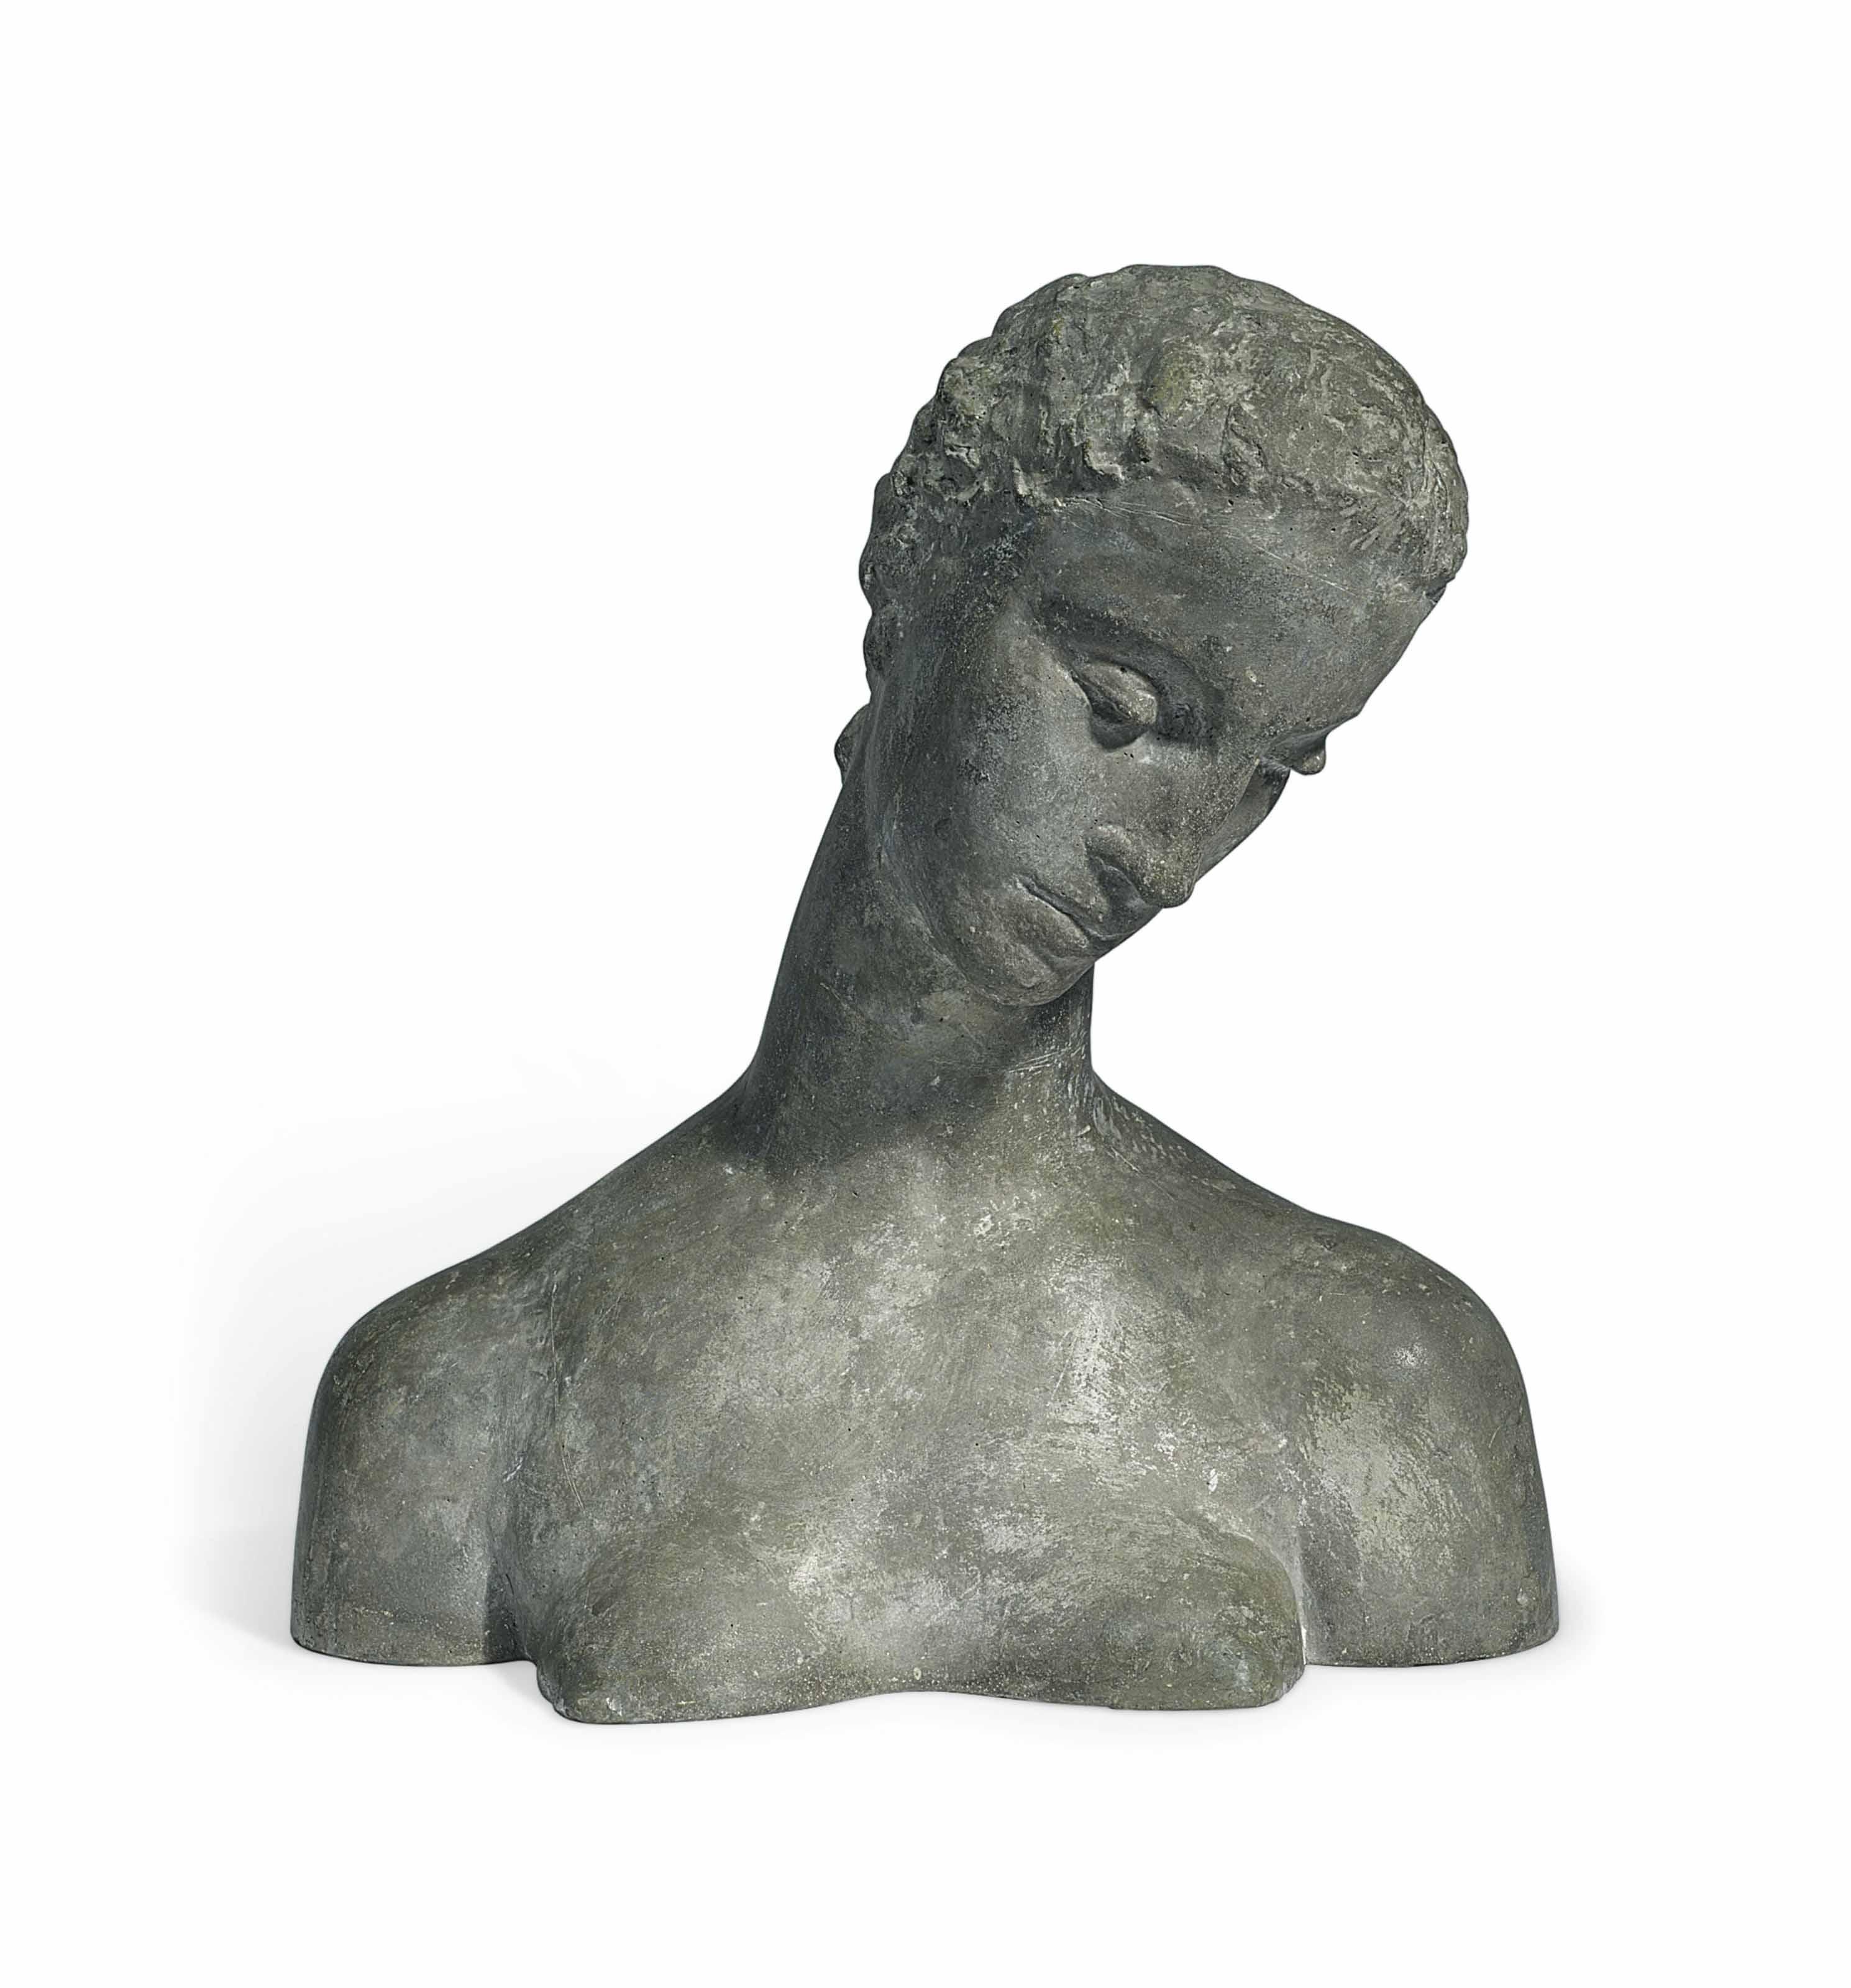 Büste der Knieenden (Geneigter Frauenkopf)